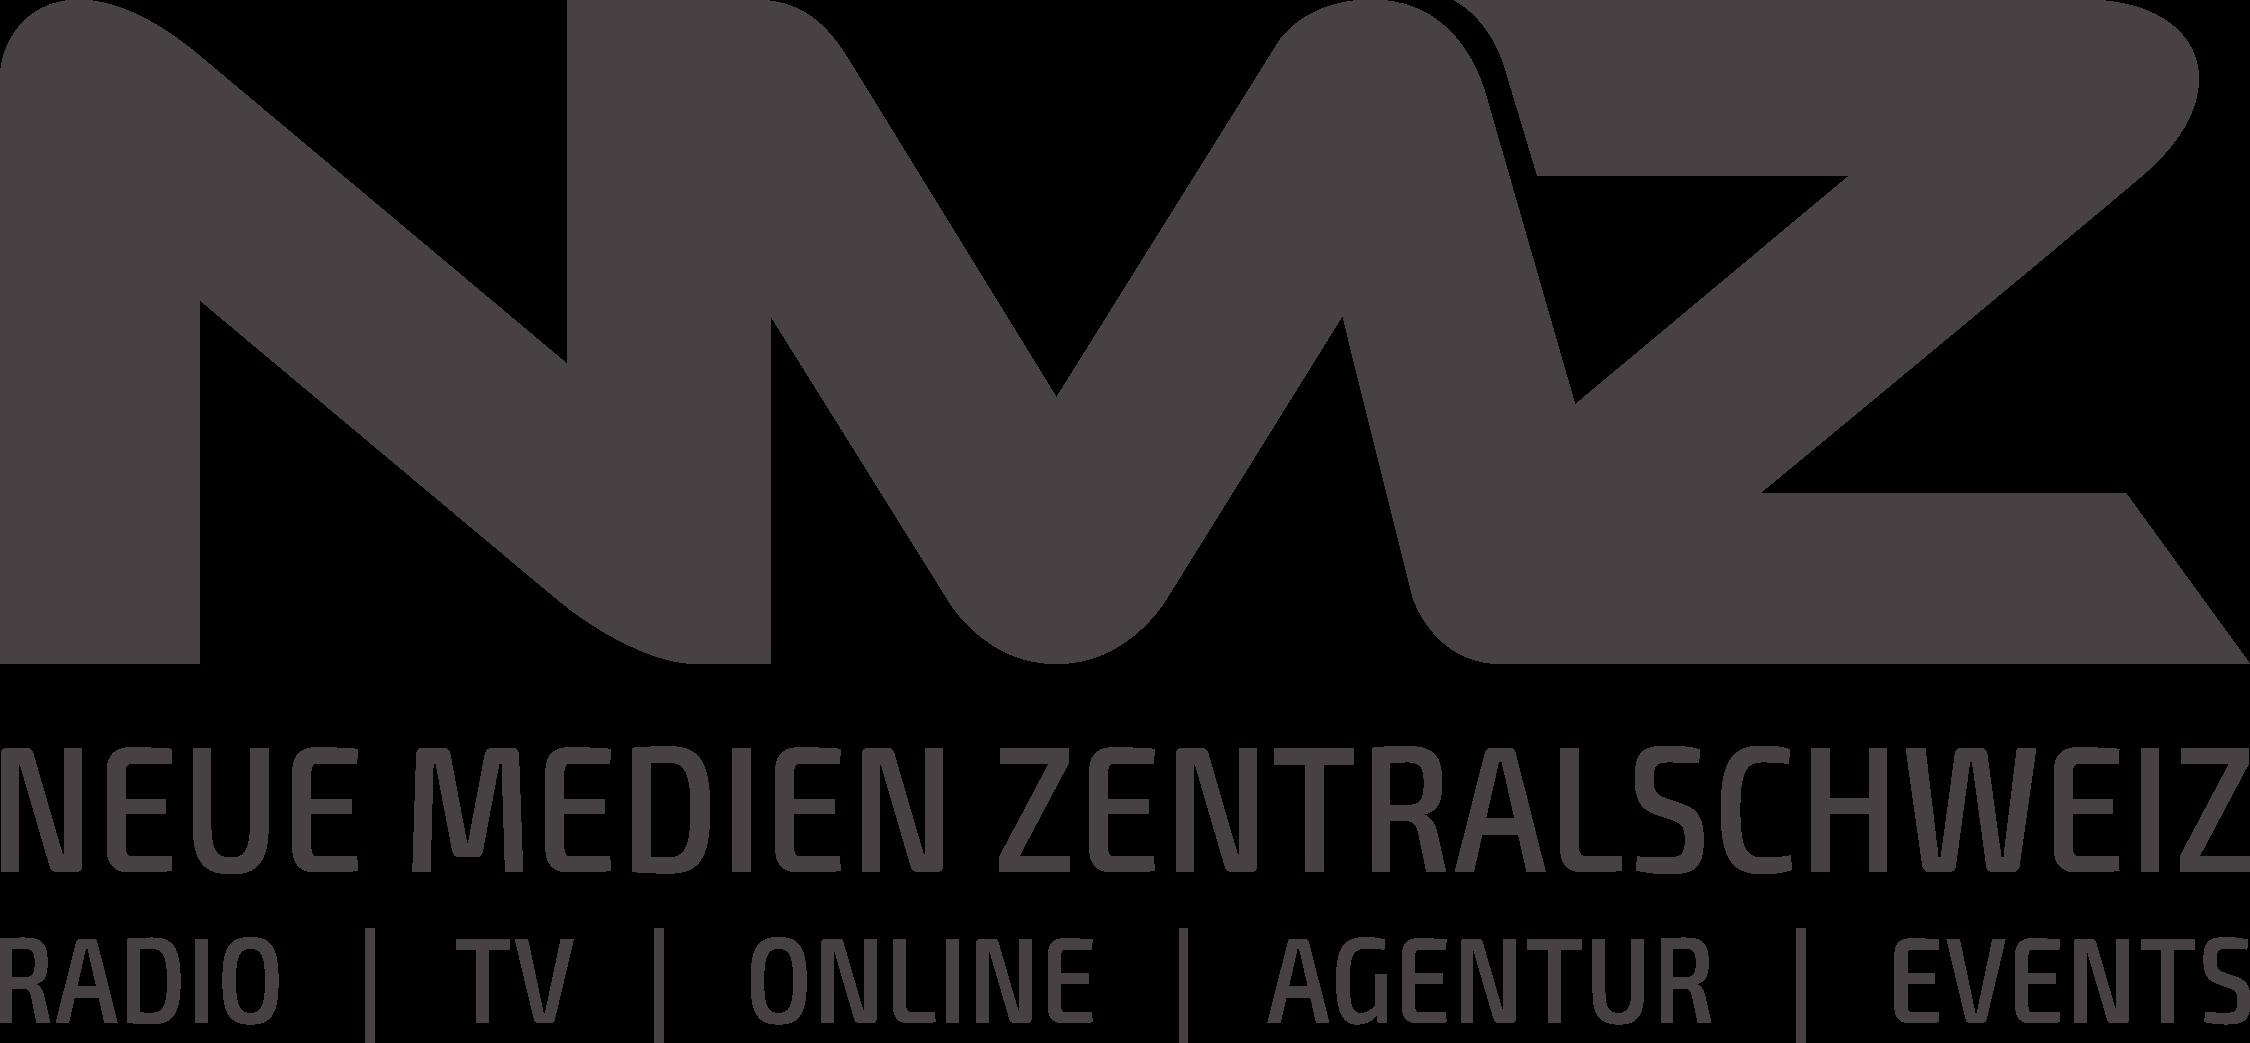 Neue Medien Zentralschweiz